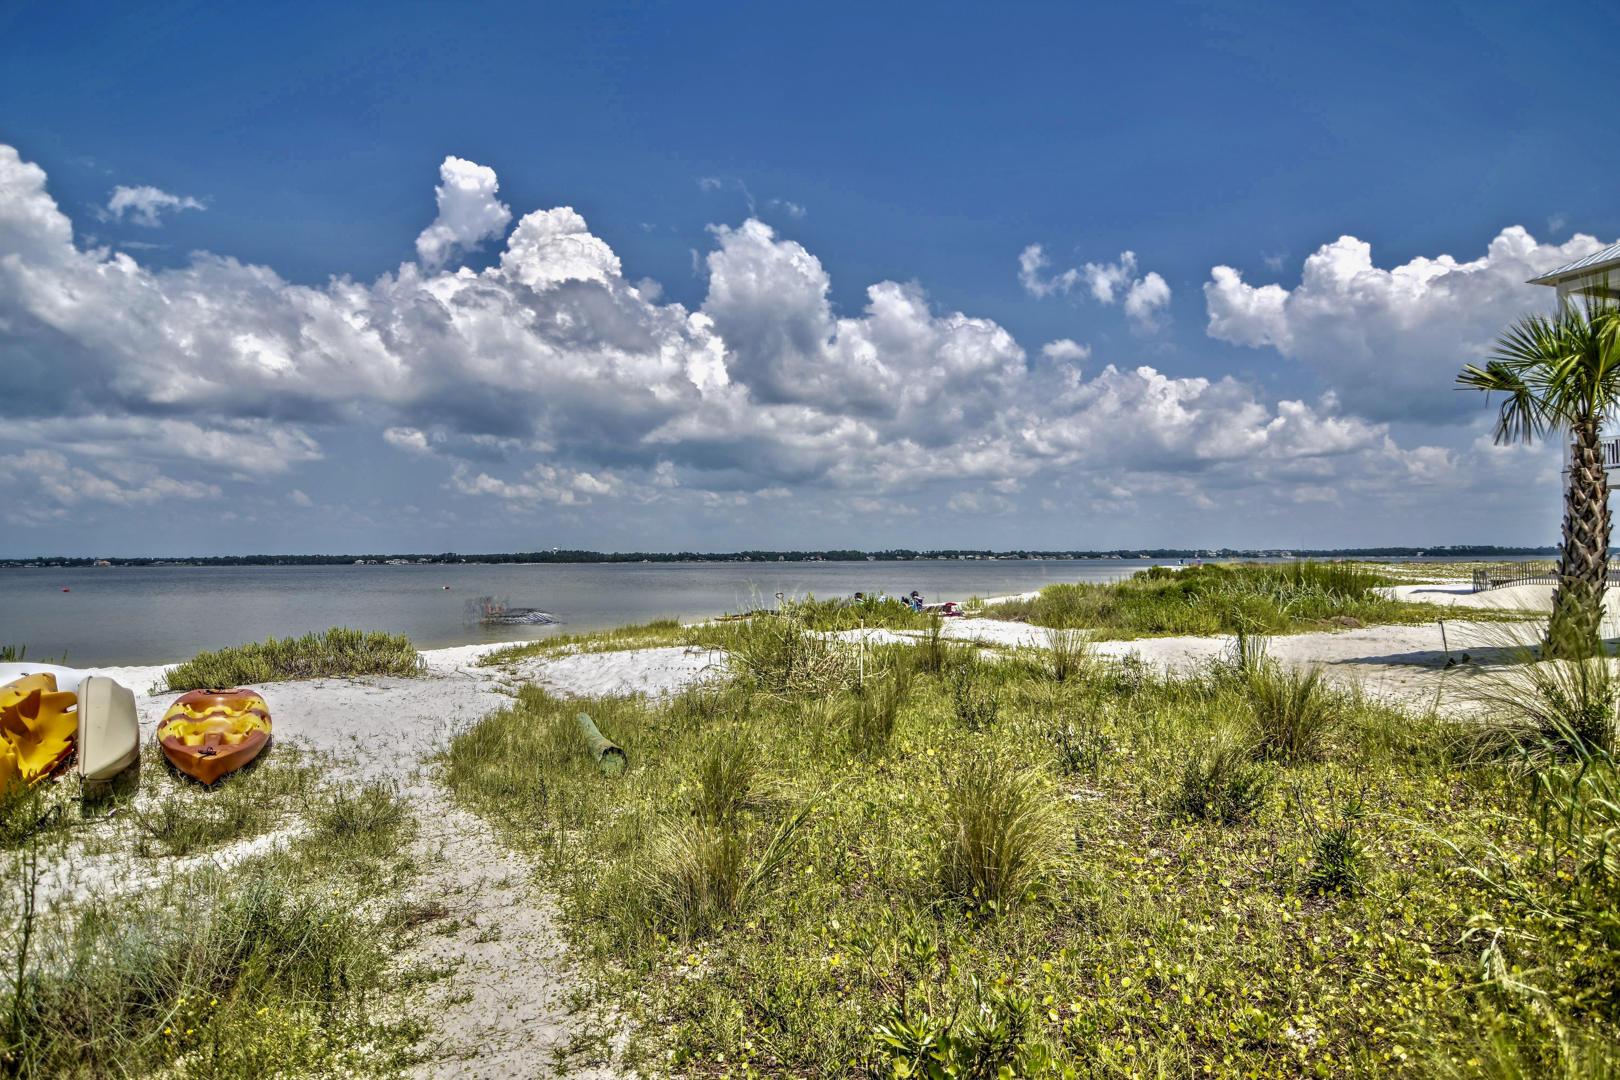 SOUND SIDE BEACH AREA